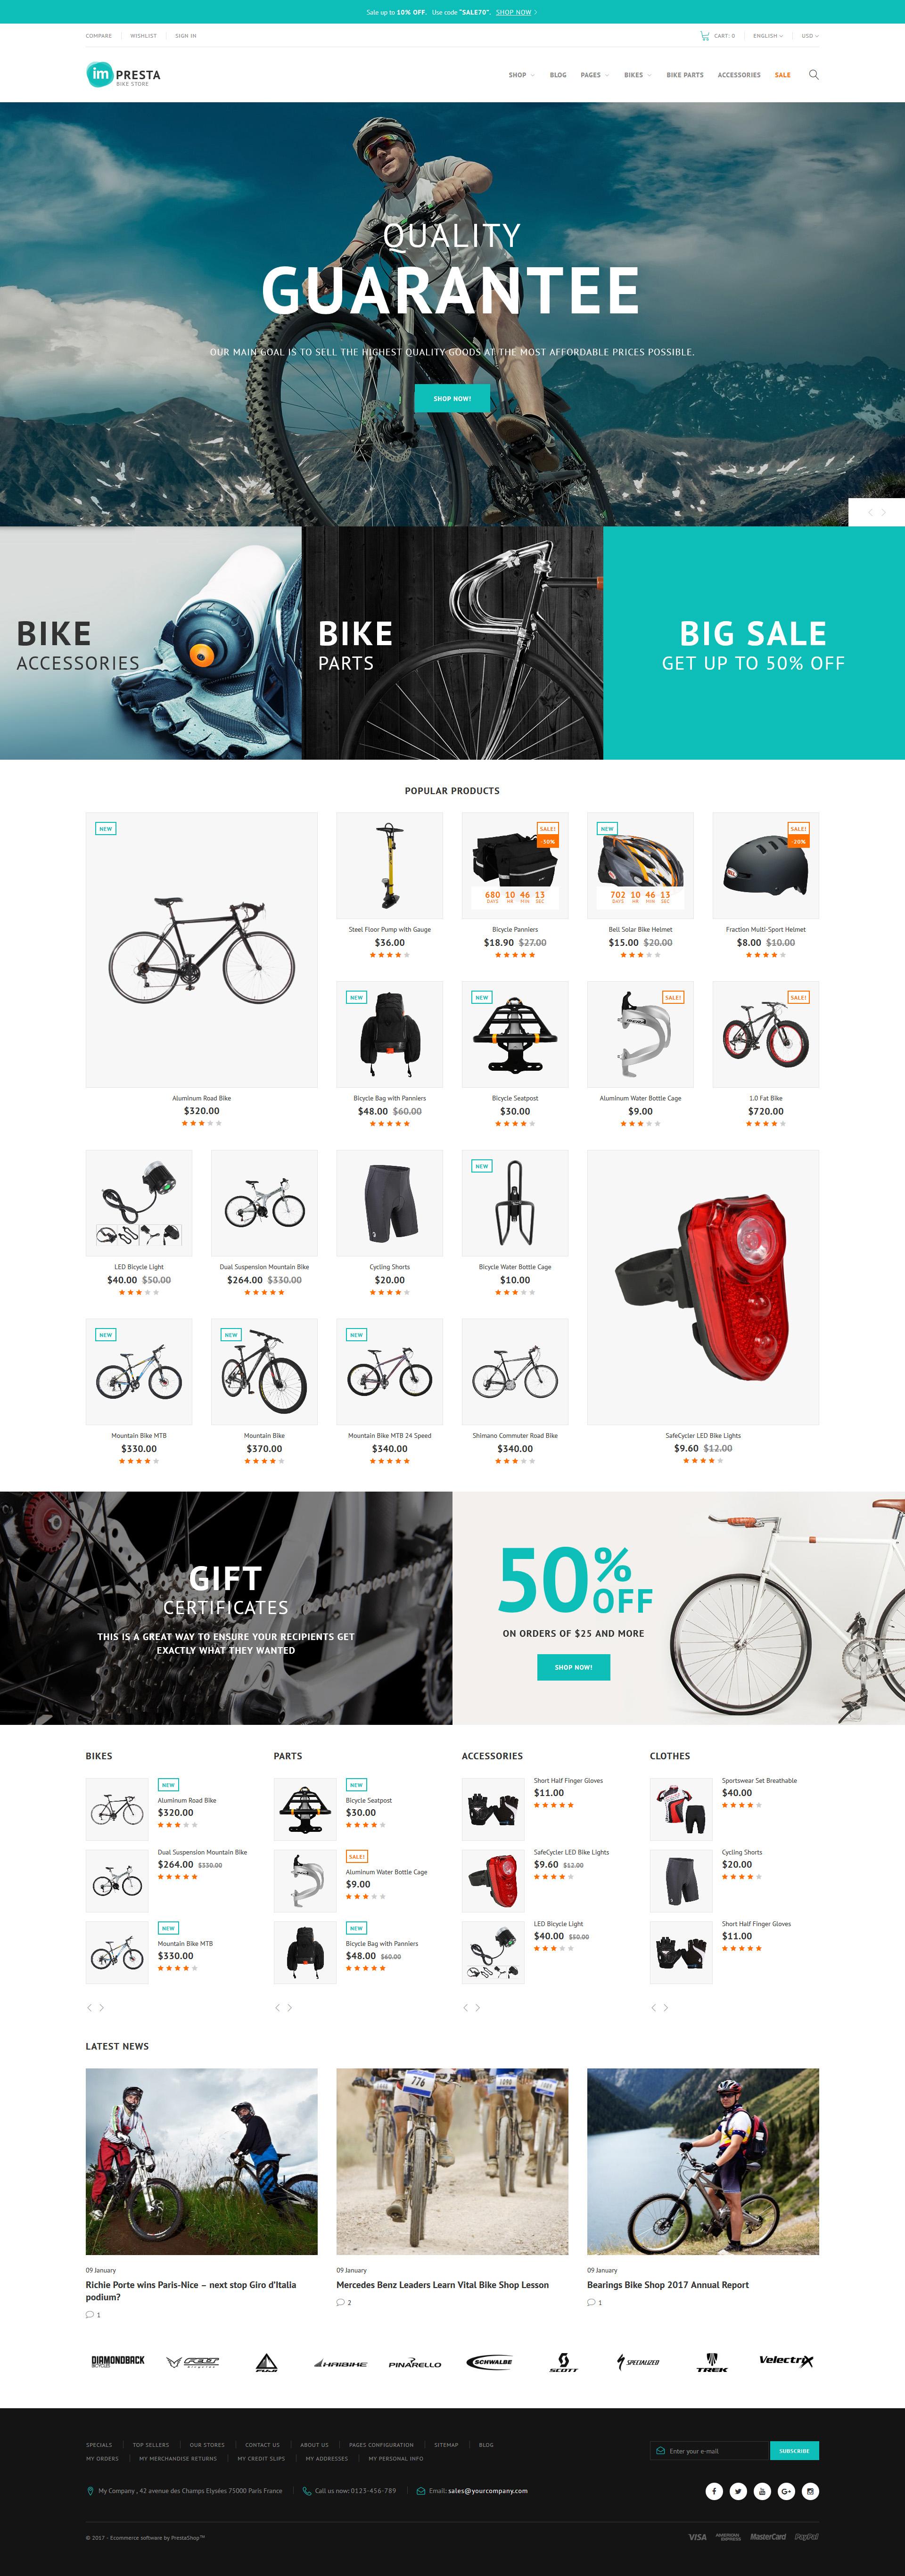 Impresta - Bike Store №64382 - скриншот